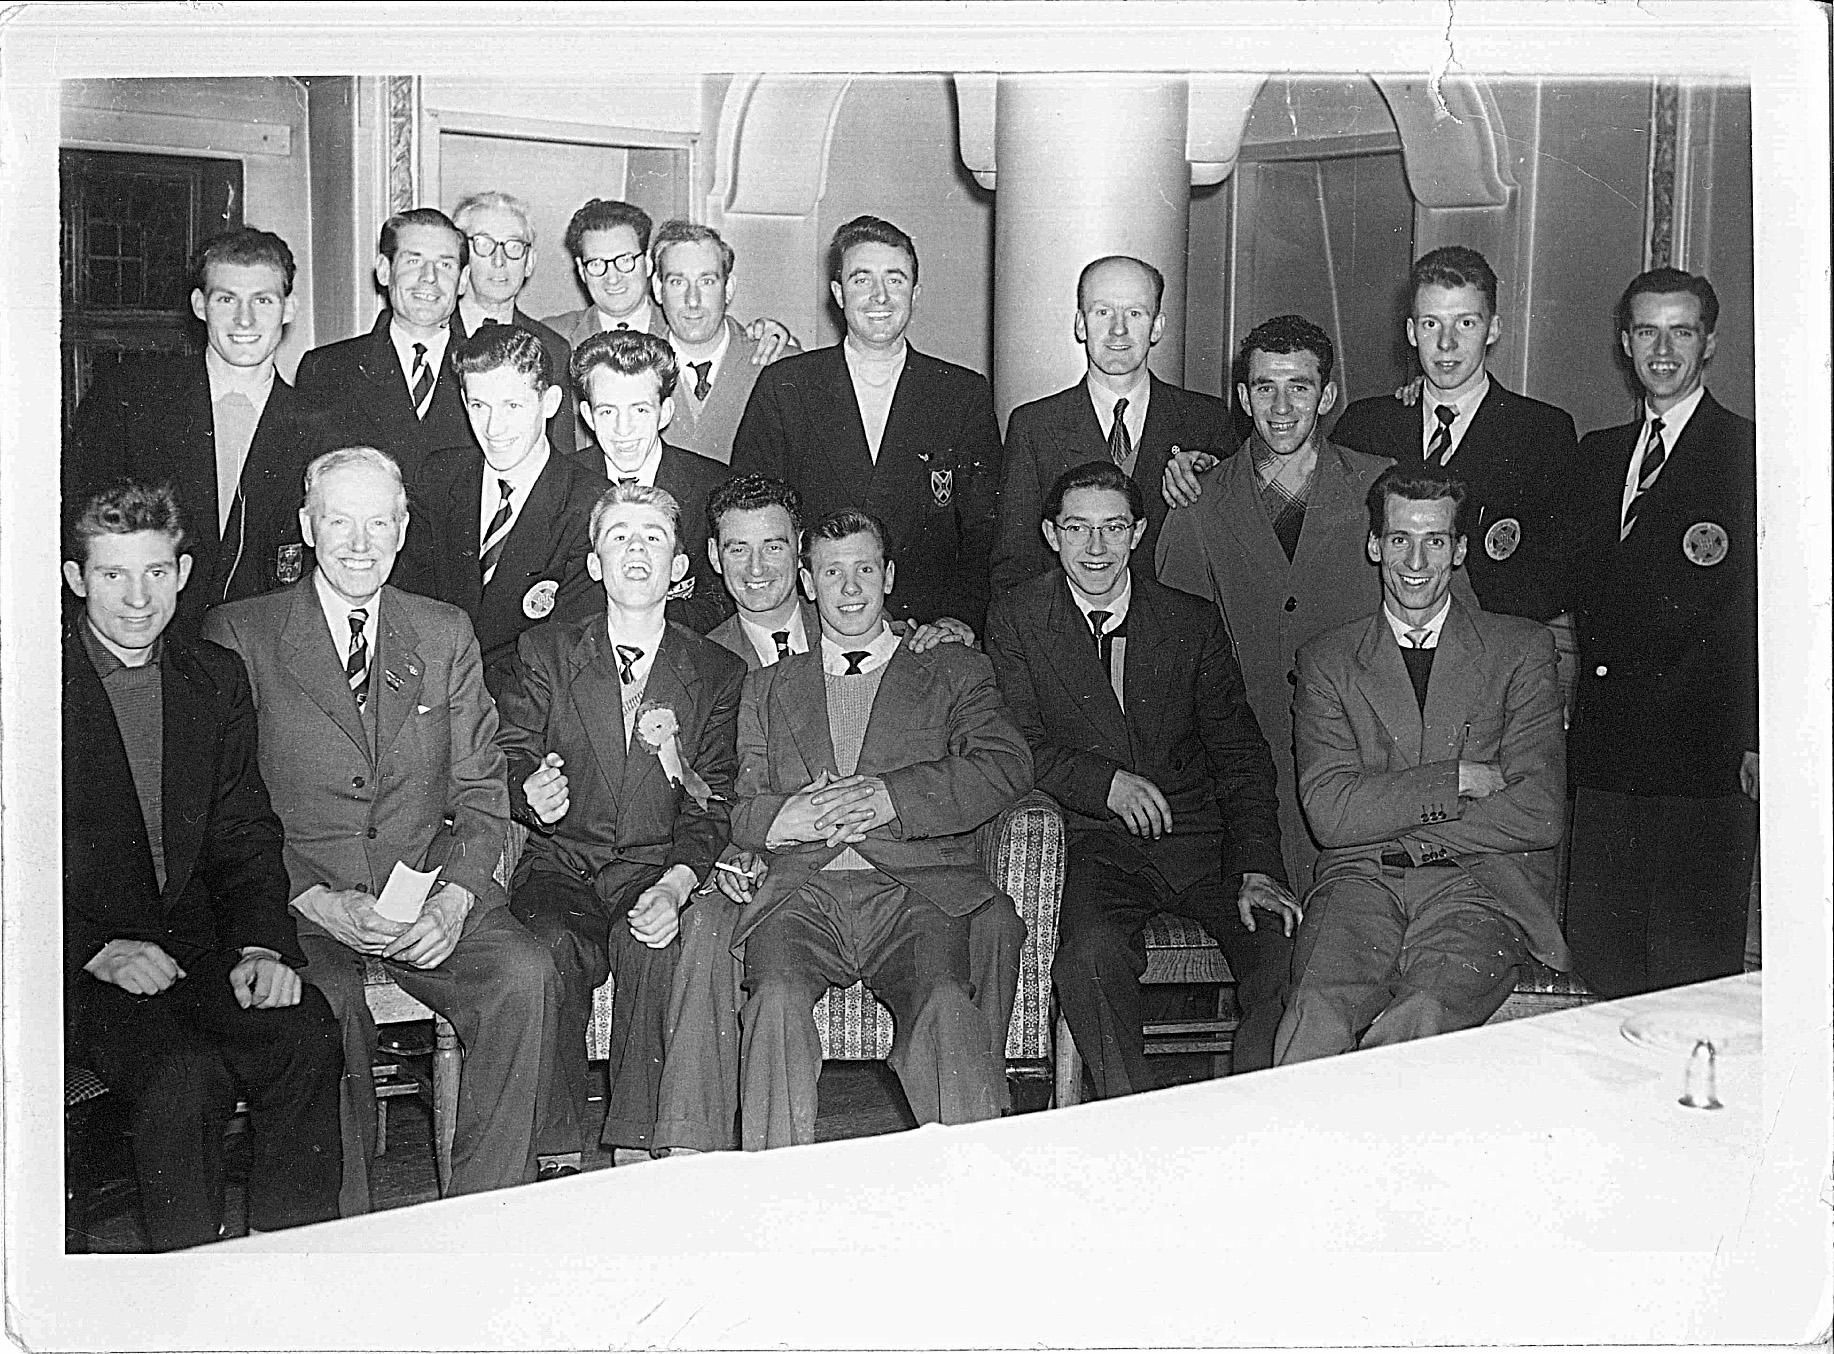 bellahouston-harriers-team-with-davie-corbett-late-1950s-1